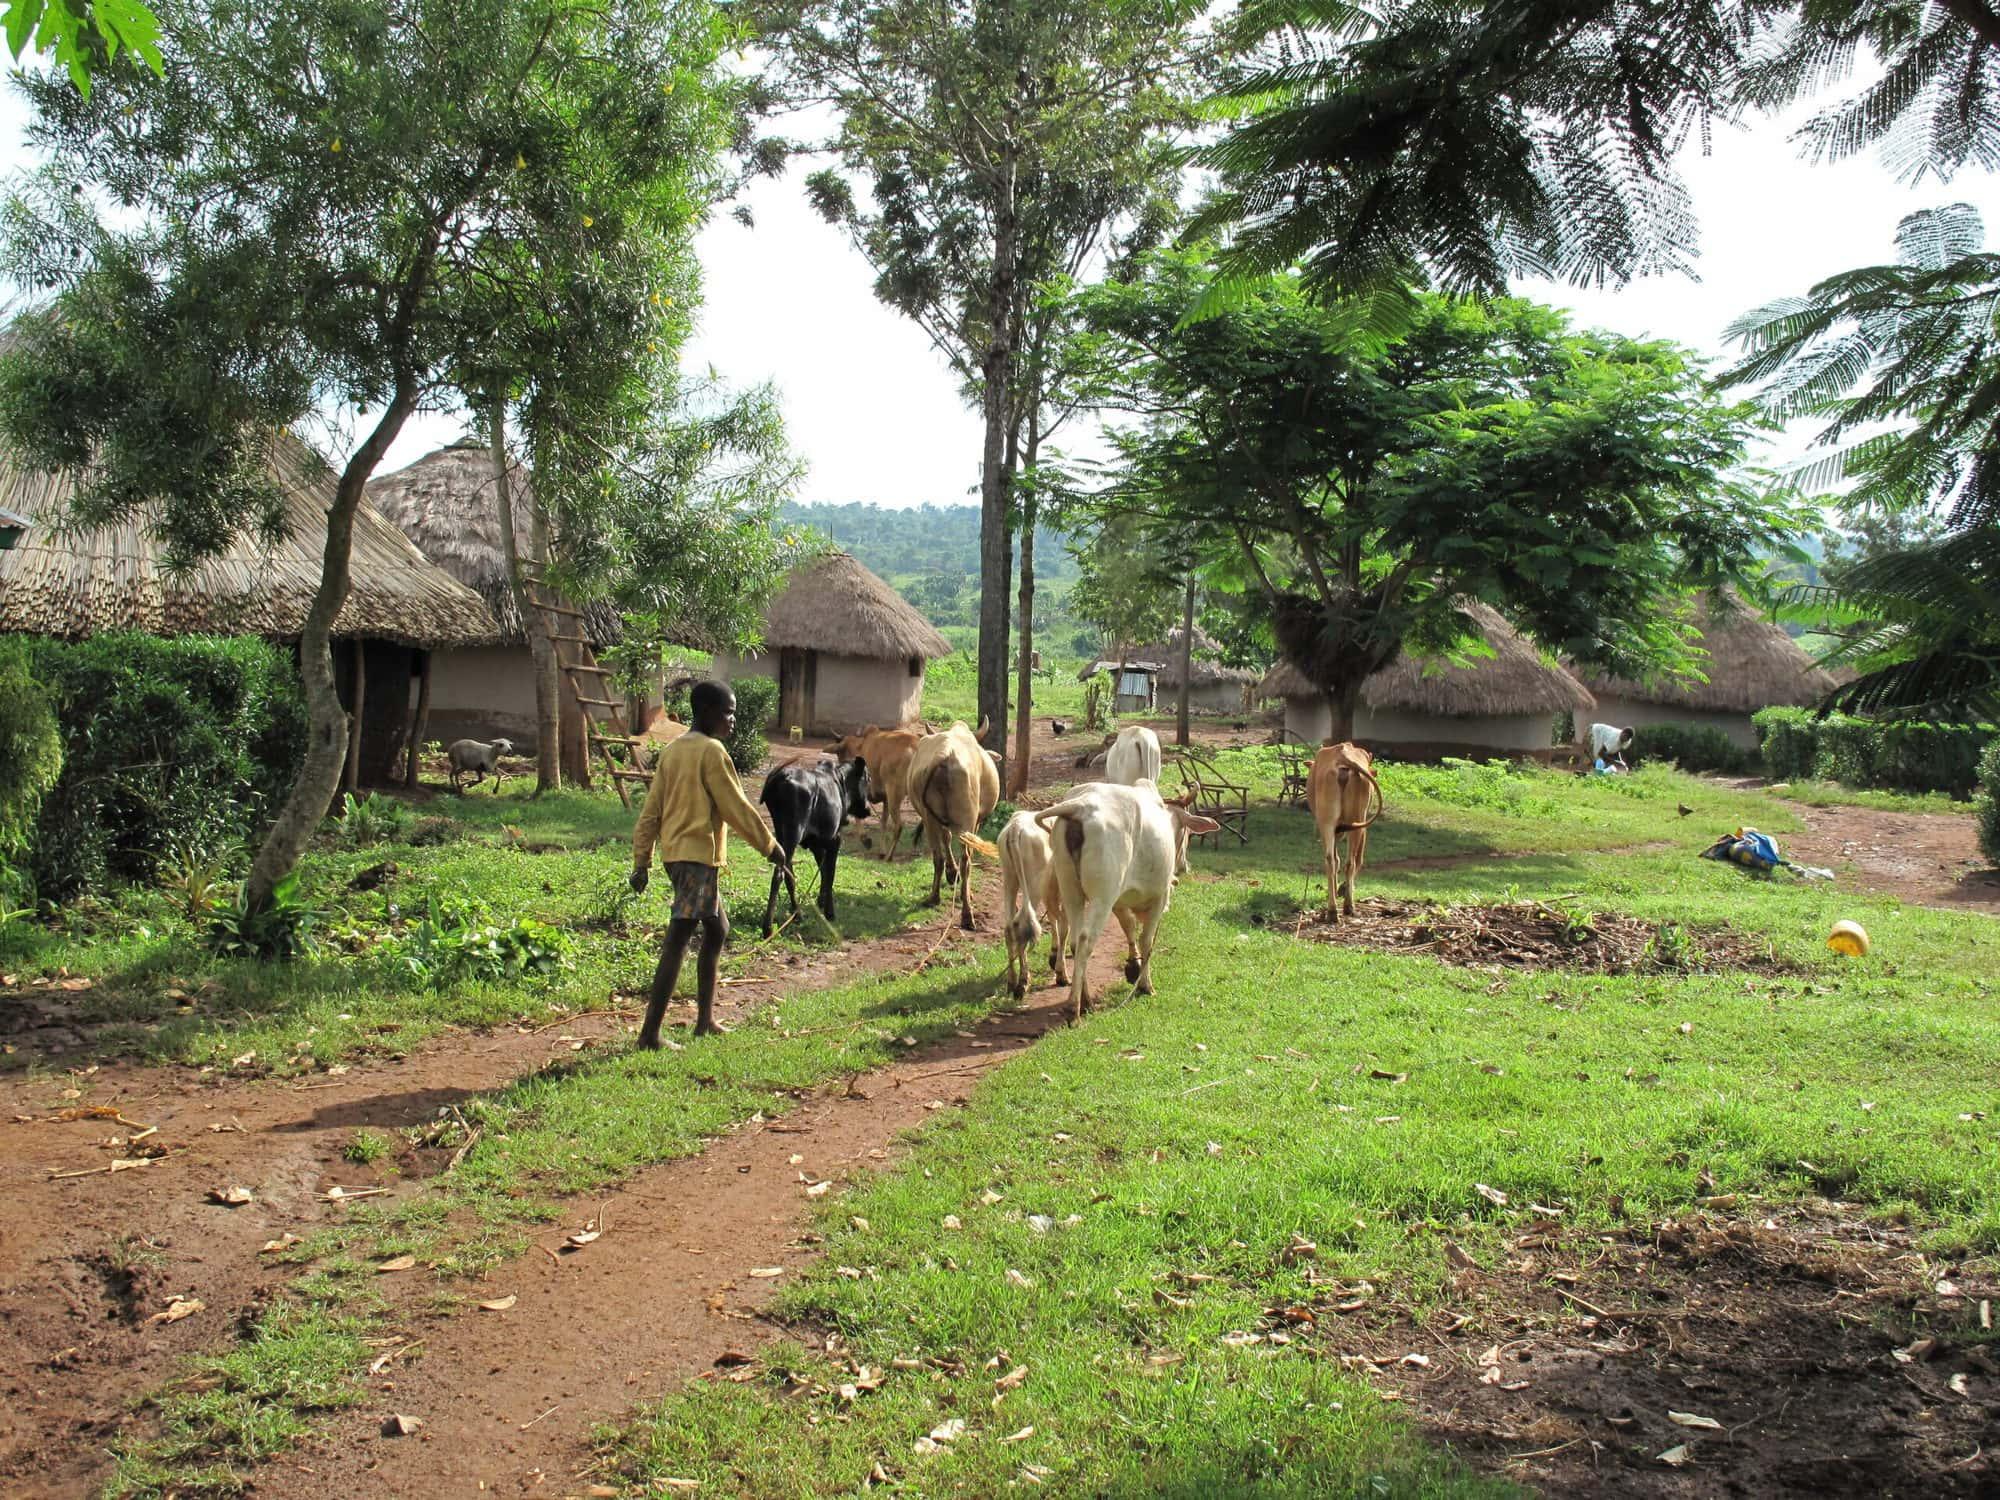 A typical mixed crop-livestock farming household, western Kenya (photo credit: ILRI/Charlie Pye-Smith)